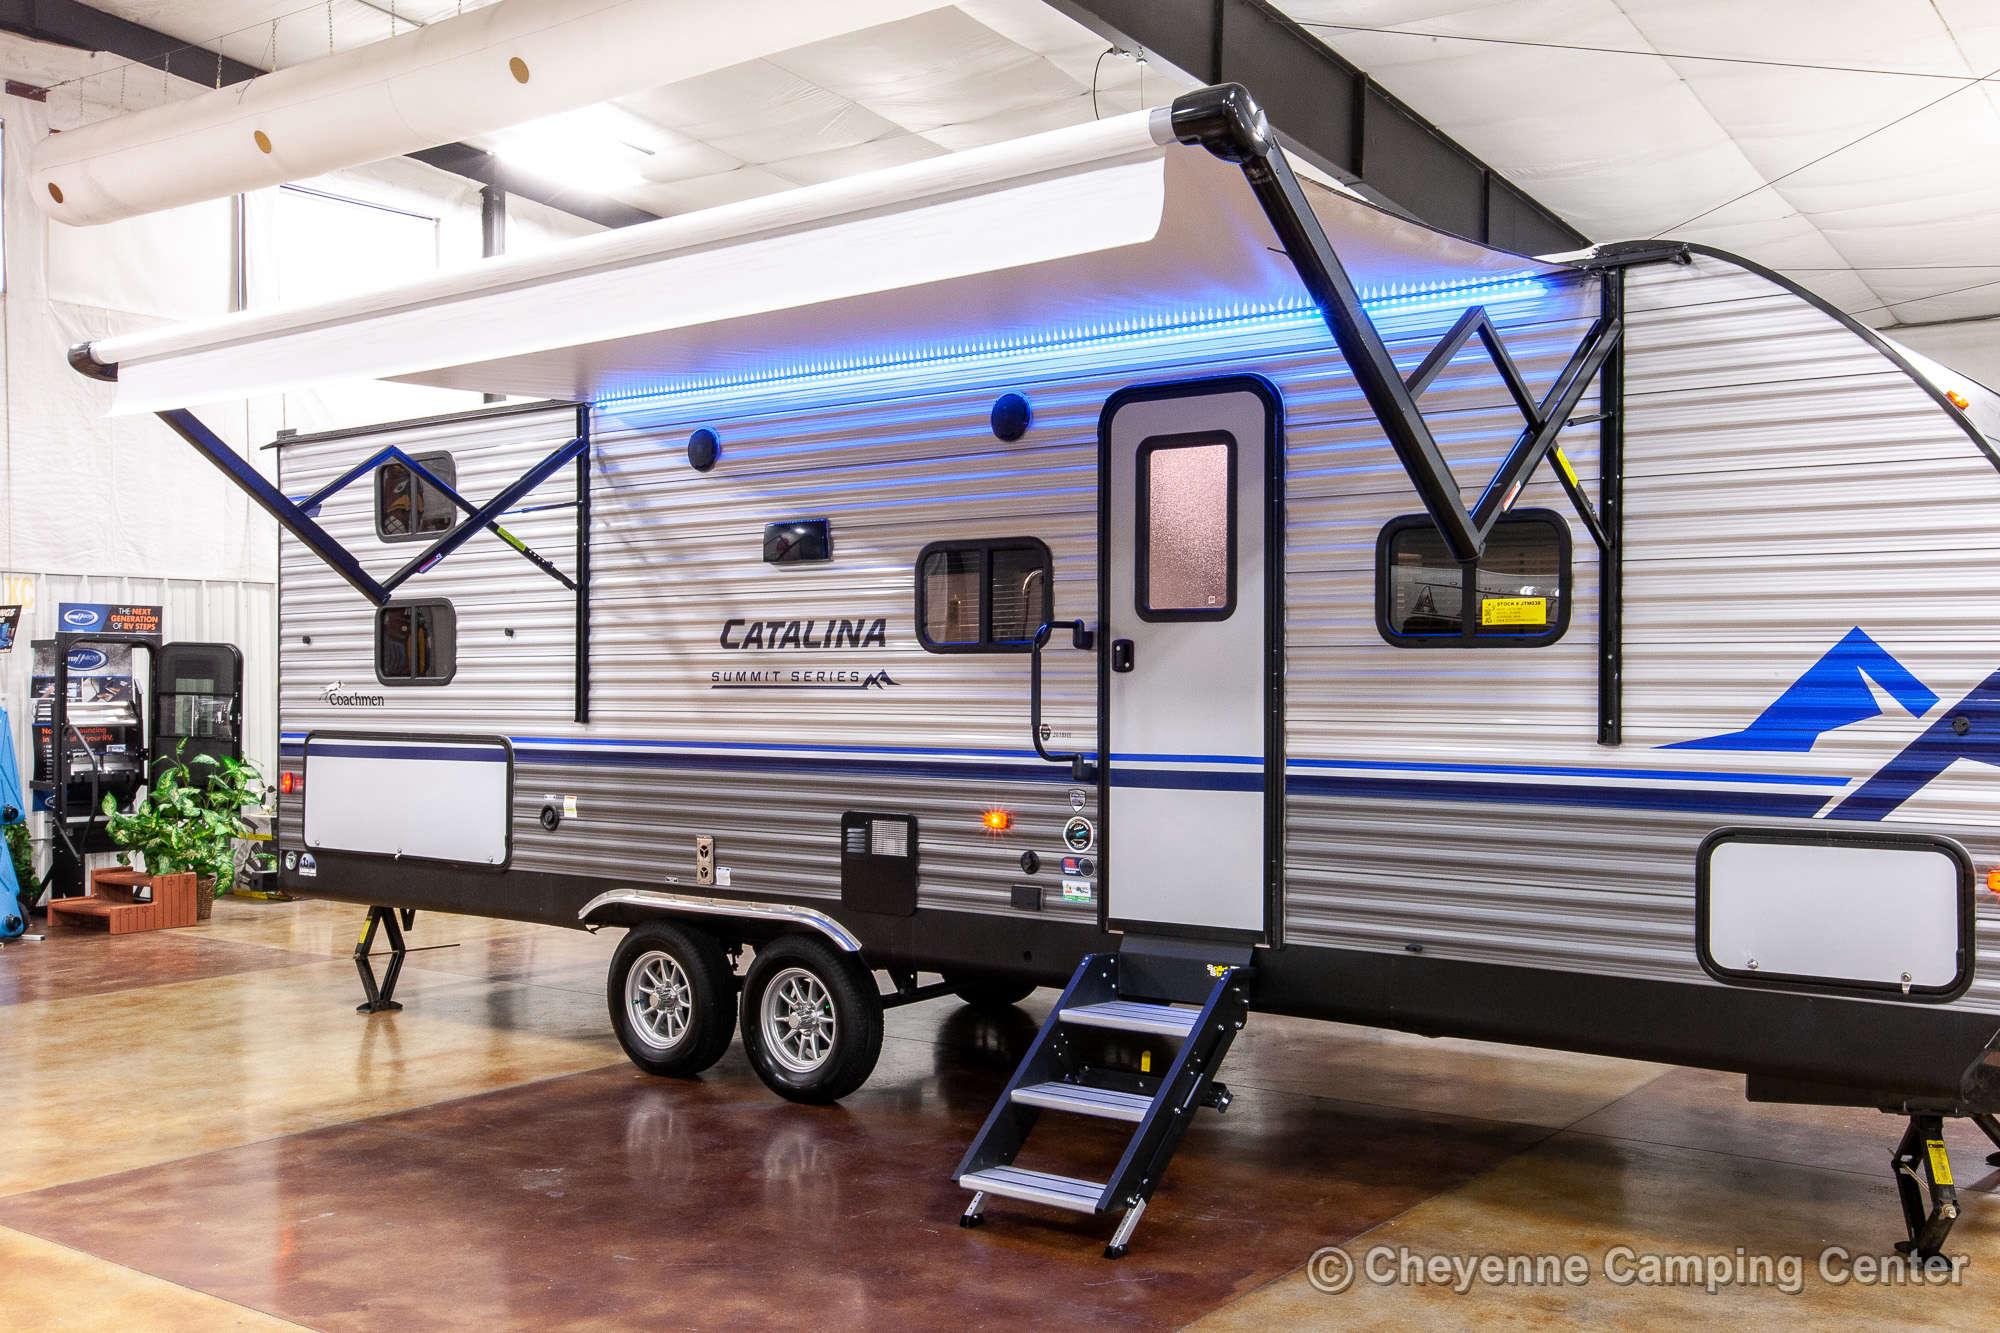 2022 Coachmen Catalina Summit Series 261BHS Bunkhouse Travel Trailer Exterior Image